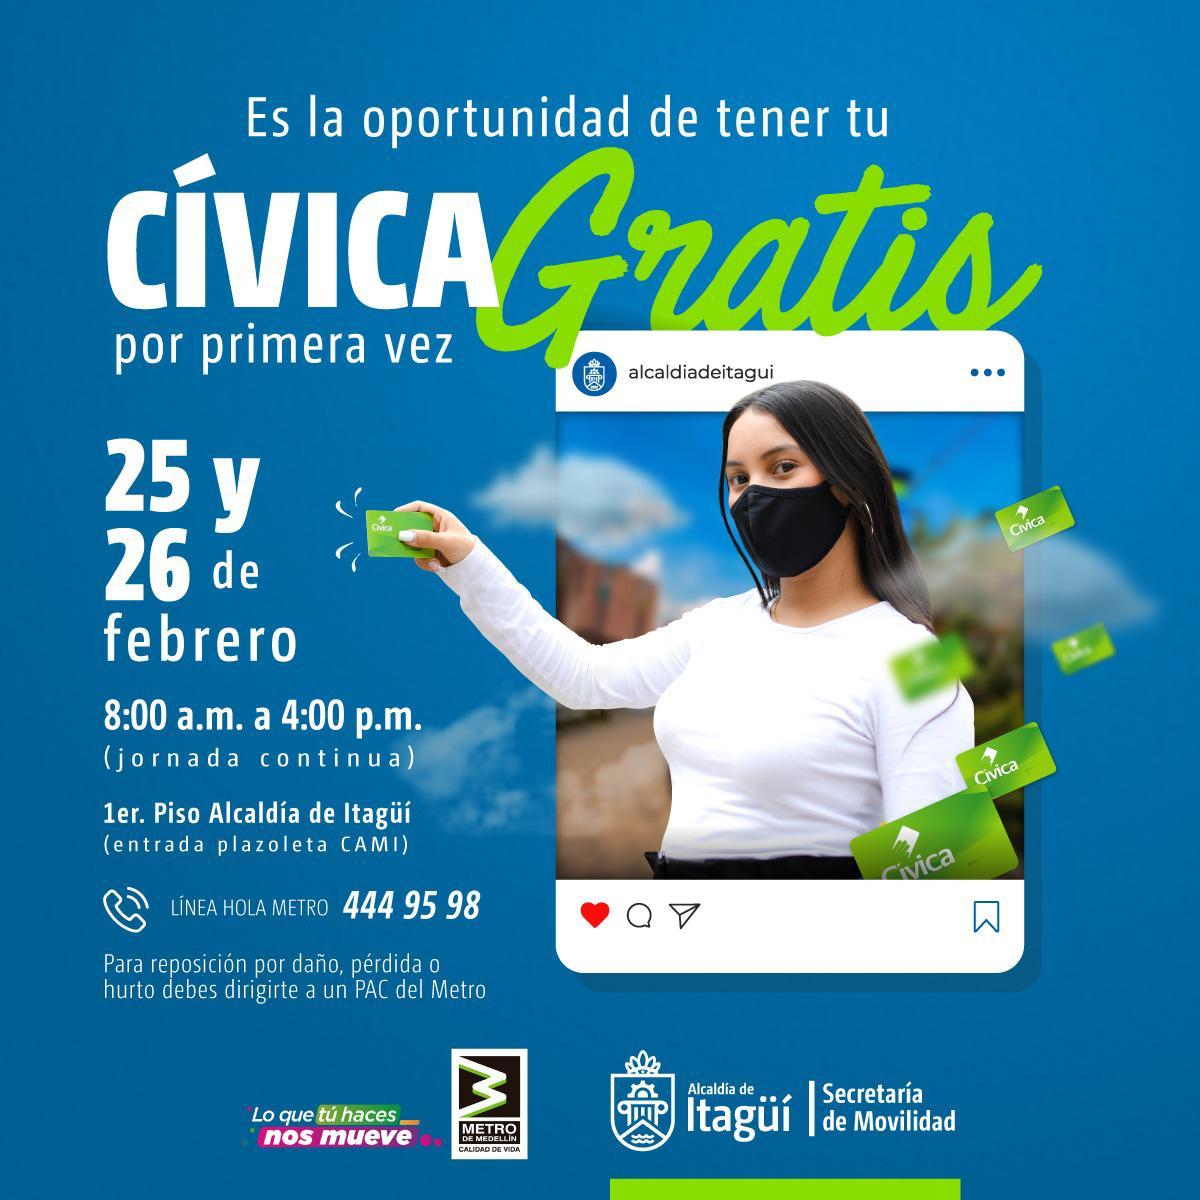 civica itagui ElMetro.com.co